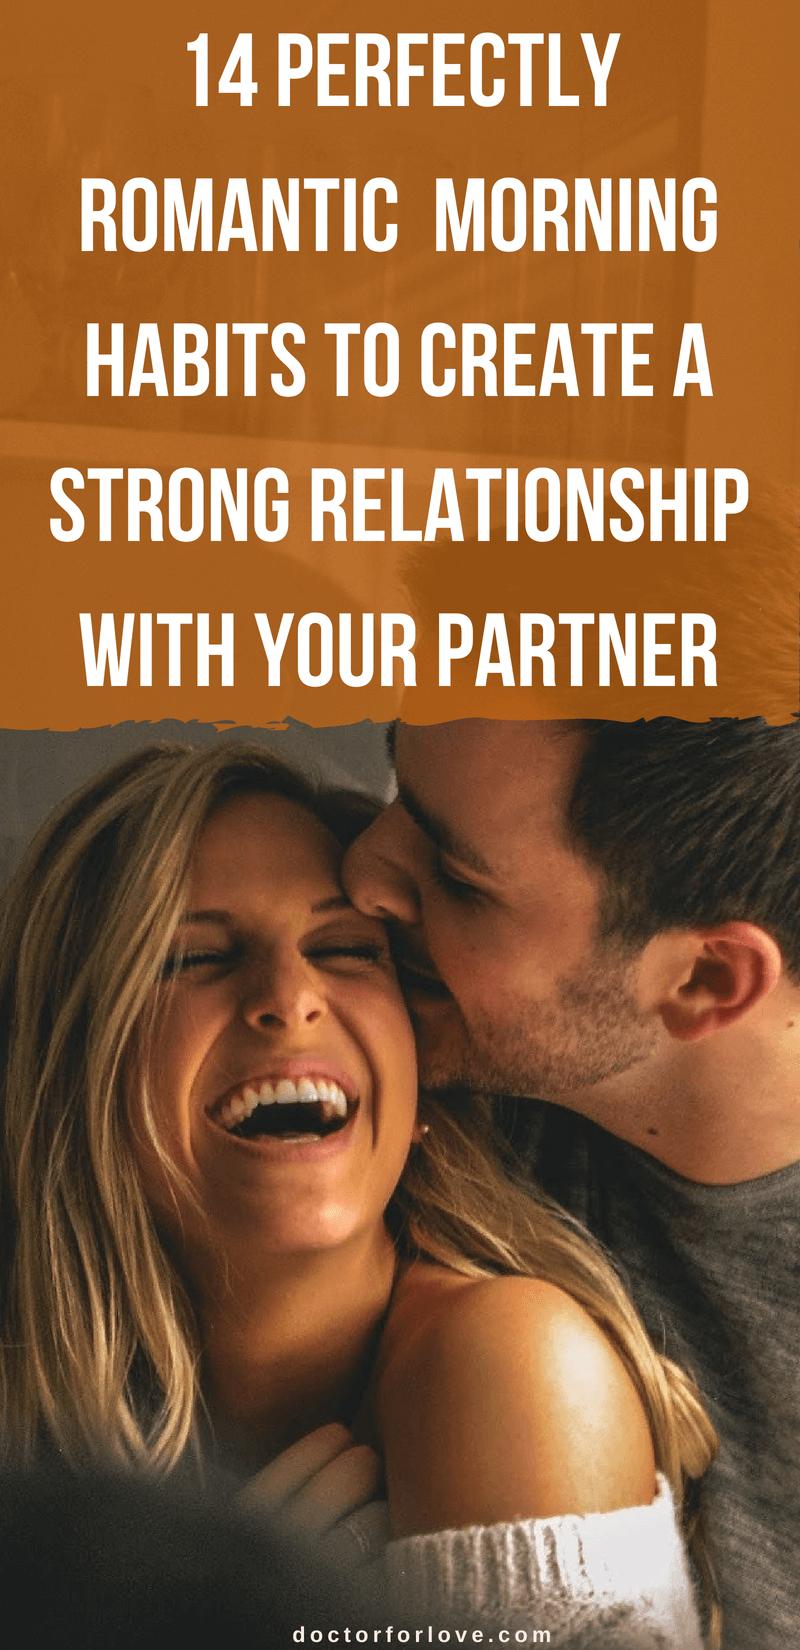 morning rituals habits couple successful relationship romantic